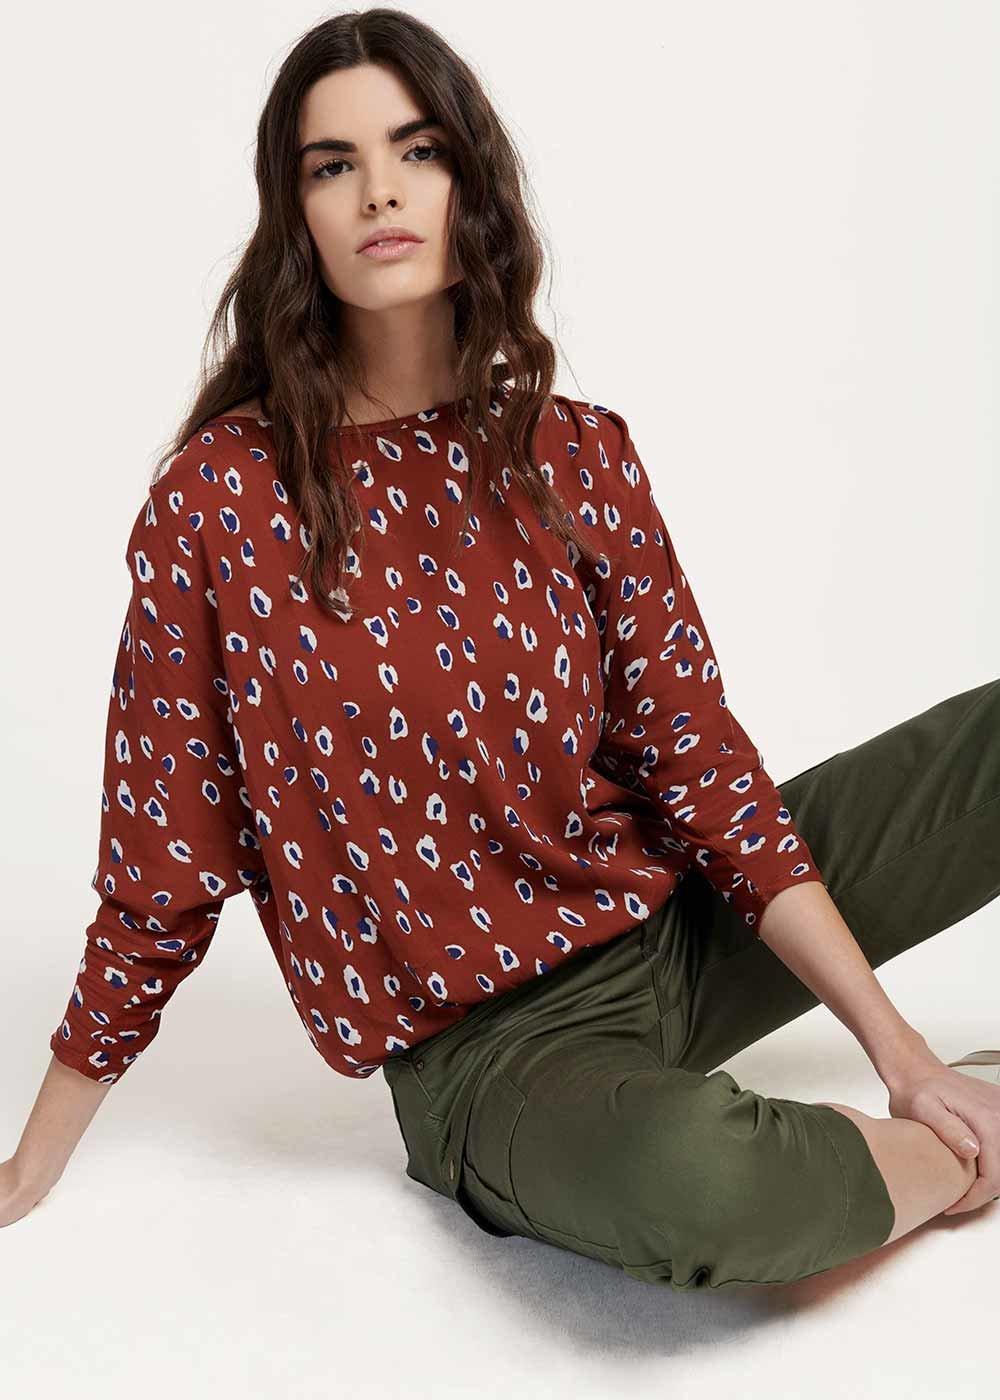 Chiara T-shirt with spotted print - Coccio / Marina Animalier - Woman